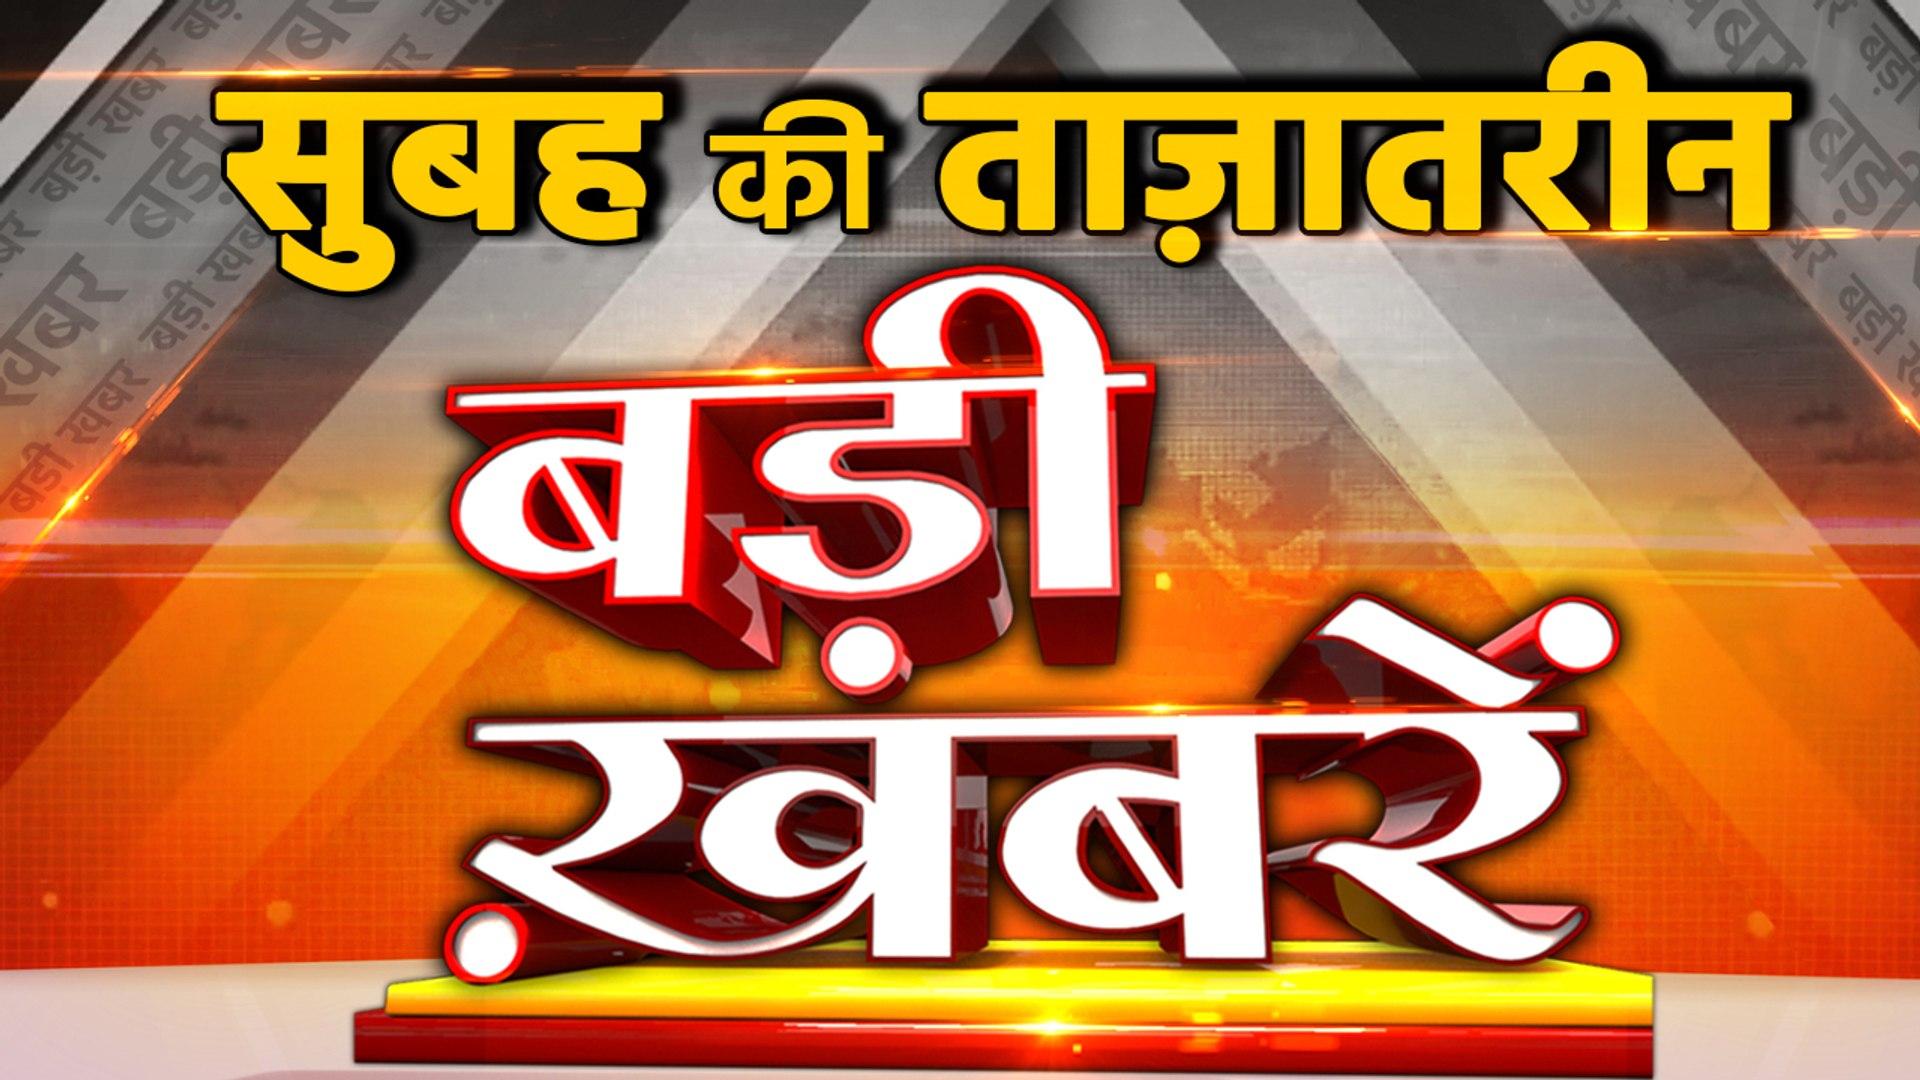 News Bulletin Today: 3 December Top News   Top News   Latest News  Top Headlines   वनइंडिया हिंदी